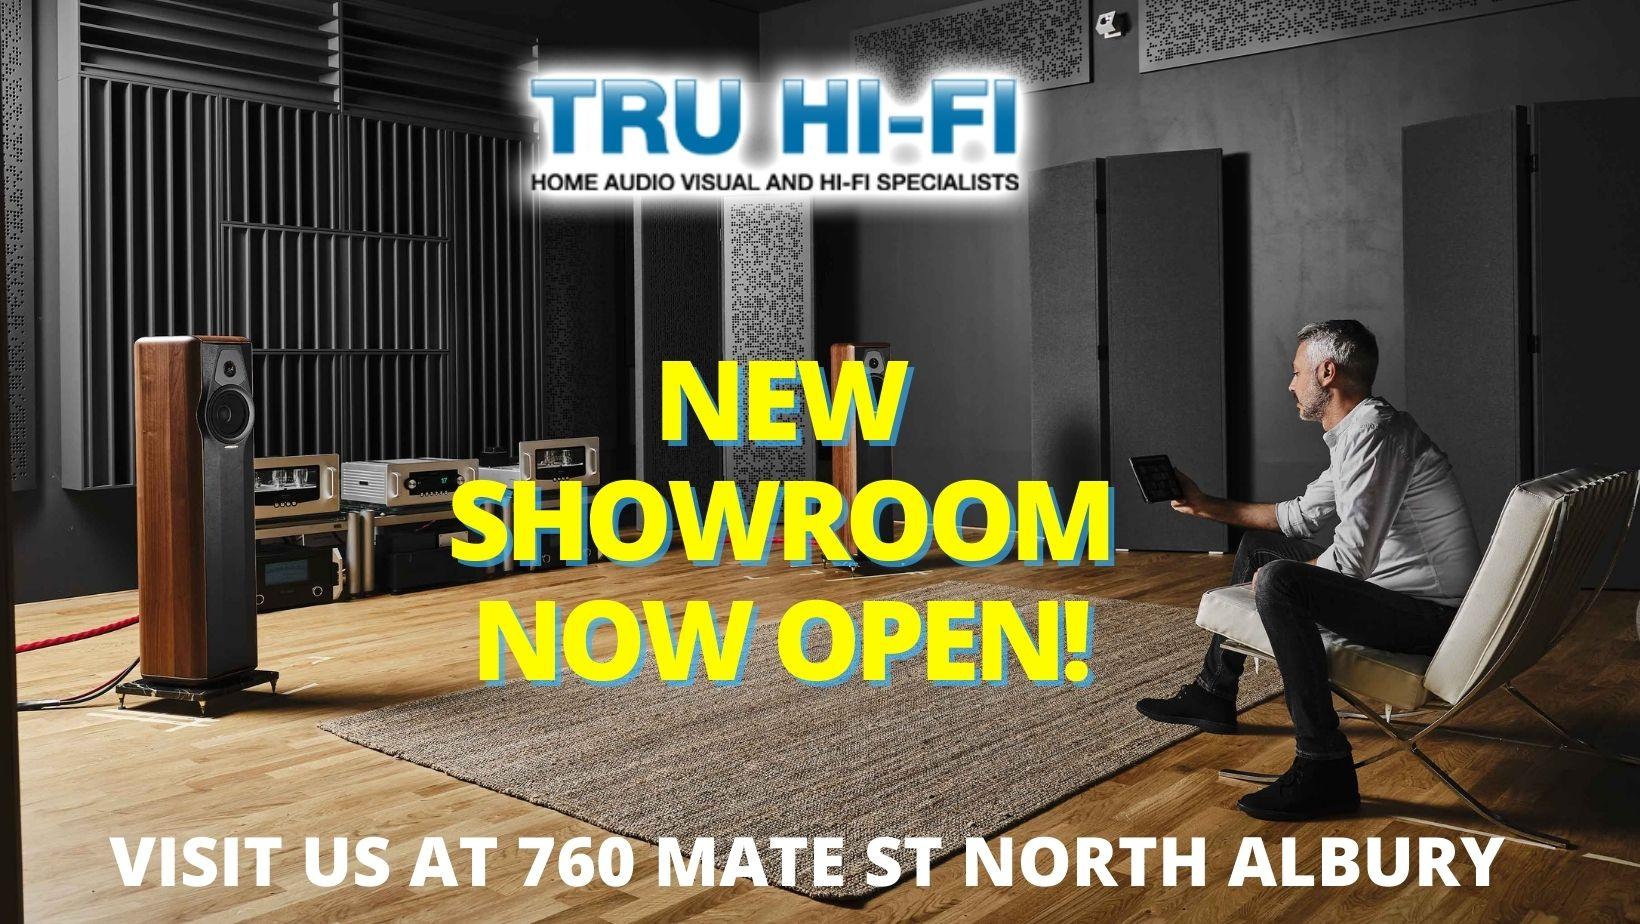 Tru Hi-Fi New Address 760 Mate St Albury